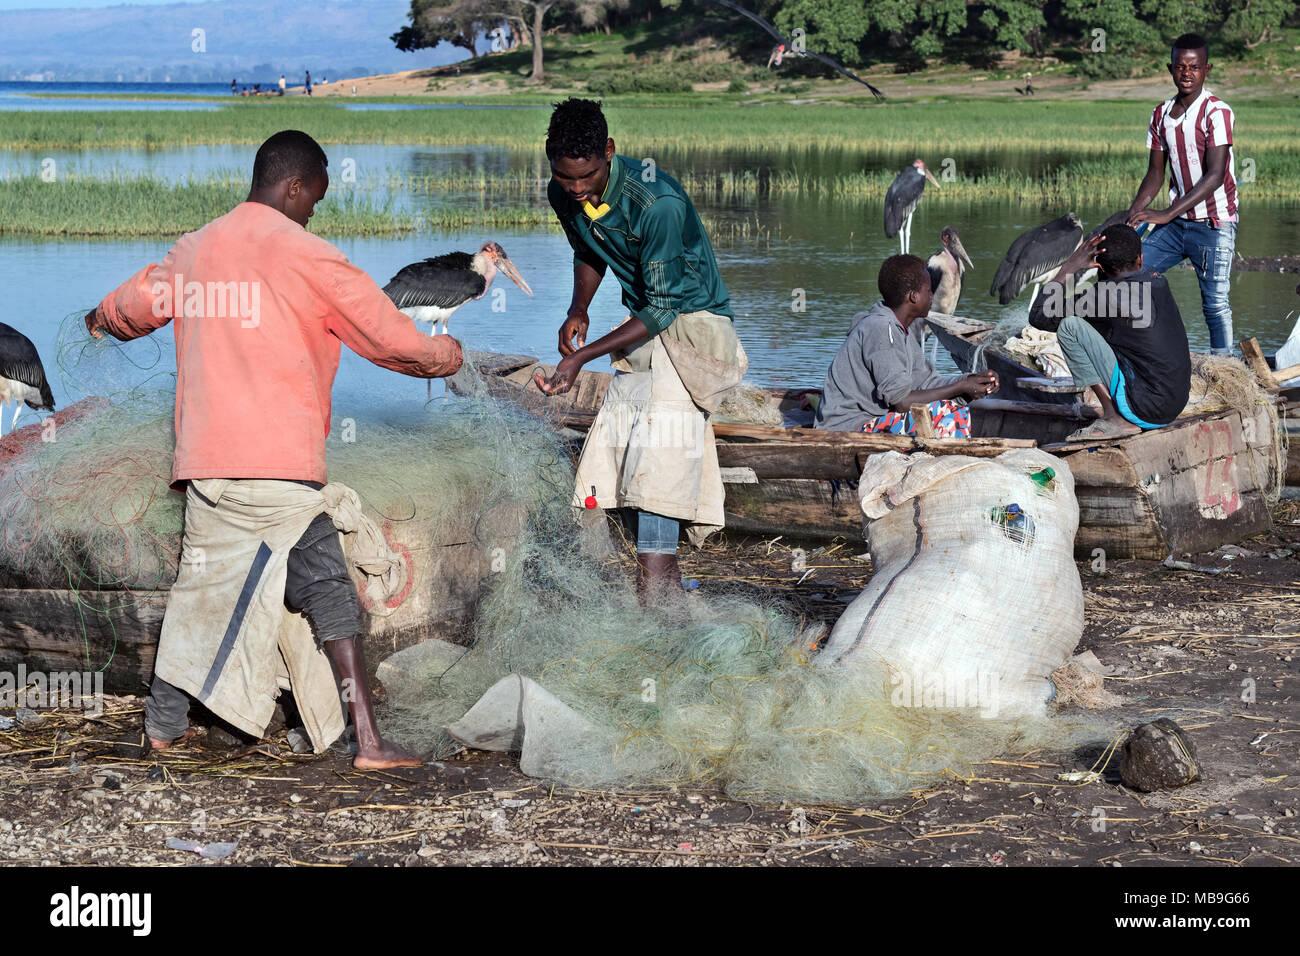 fishers, lake Awasa, Ethiopia - Stock Image